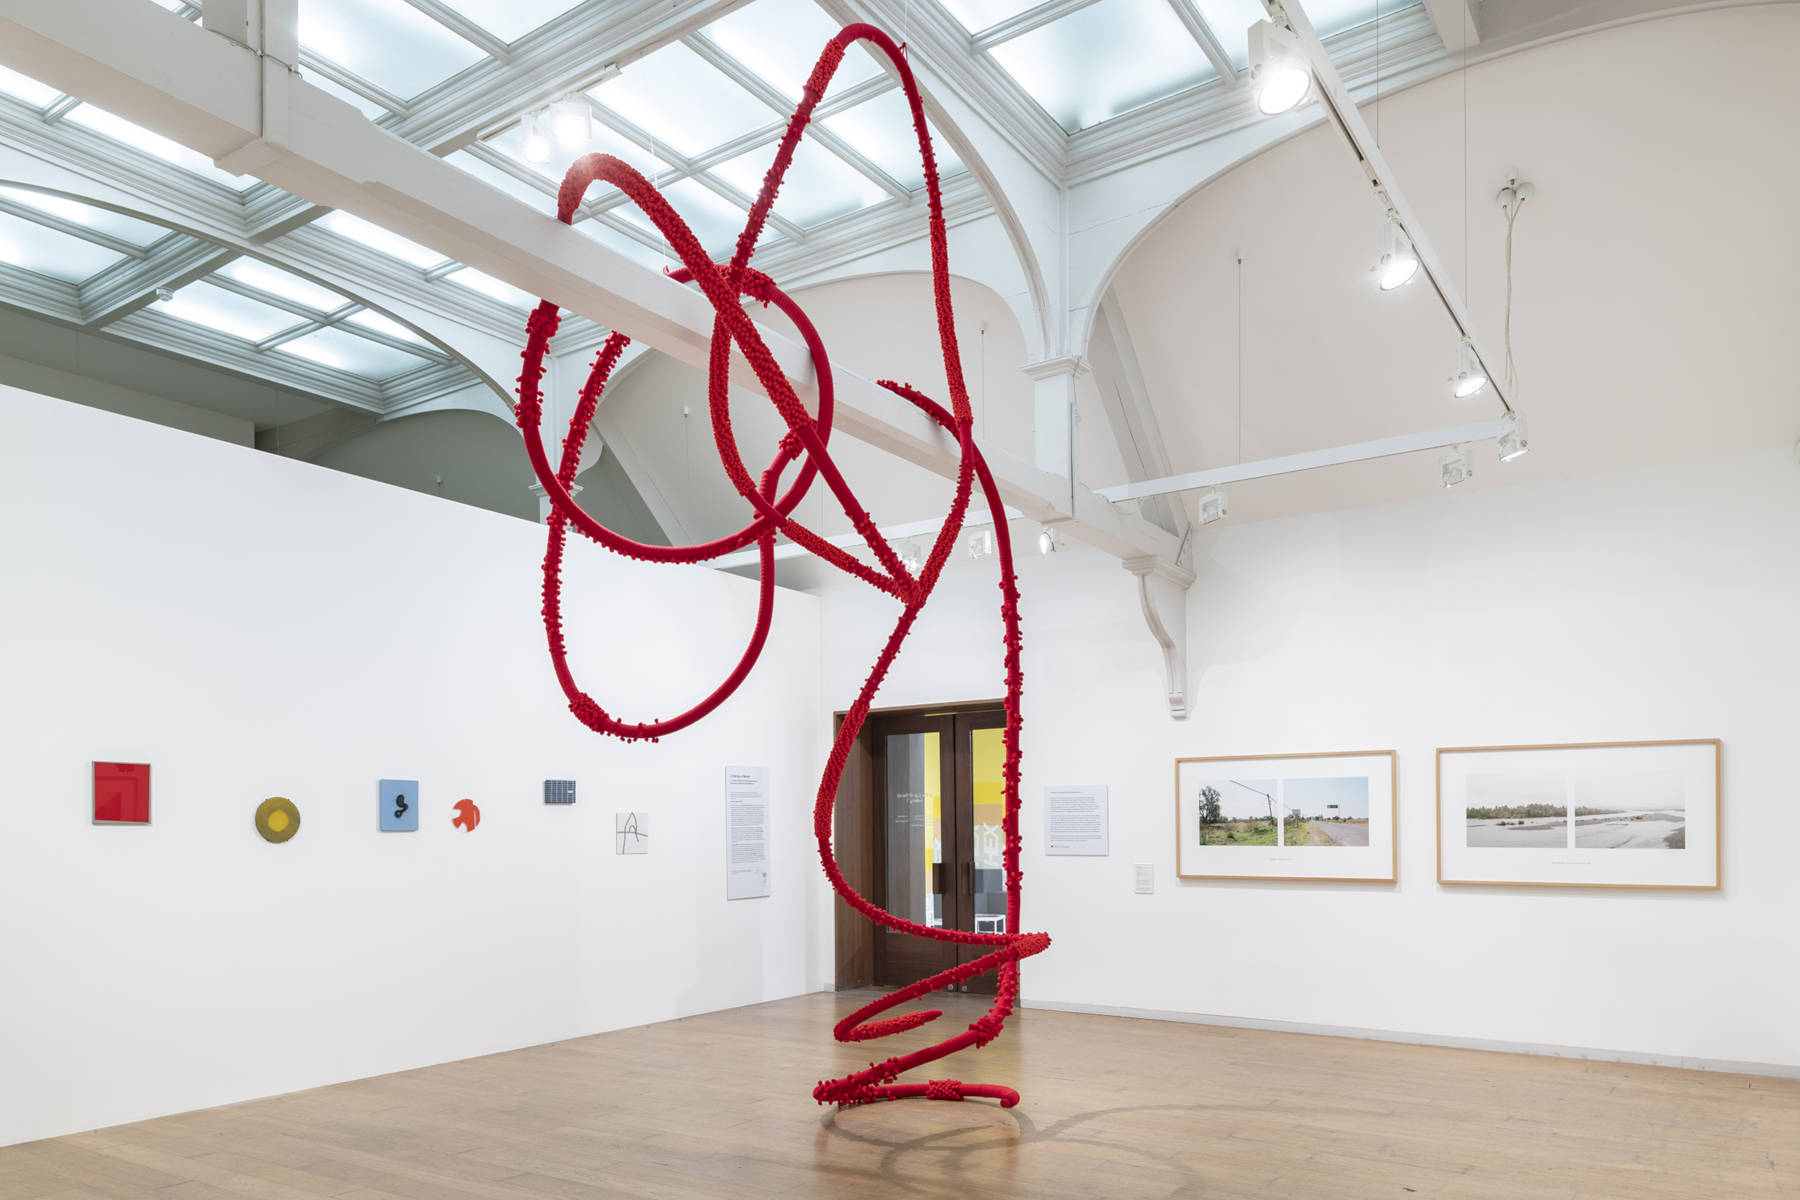 Whitechapel Gallery In the Eye of the Bambi la Caixa 1